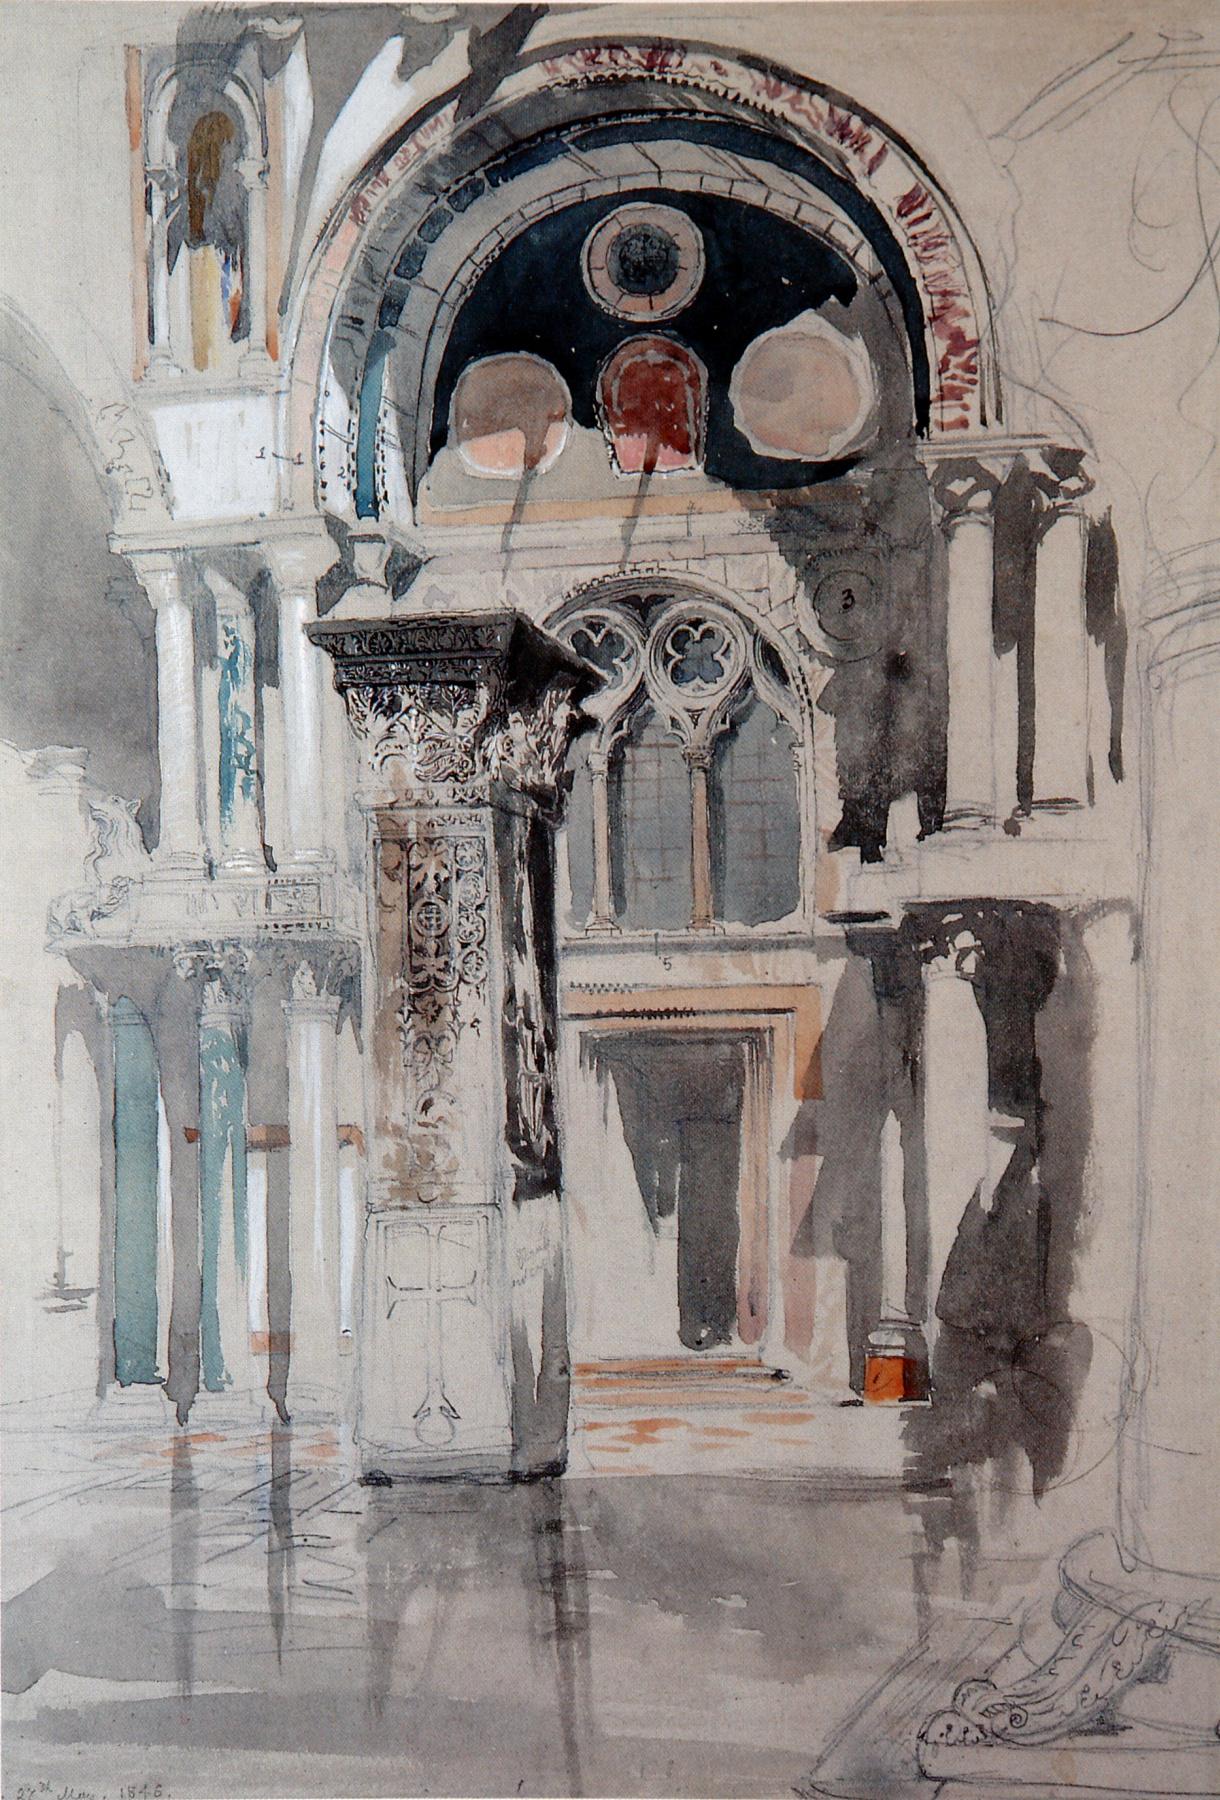 Джон Рёскин. Собор Святого Марка после дождя, Венеция